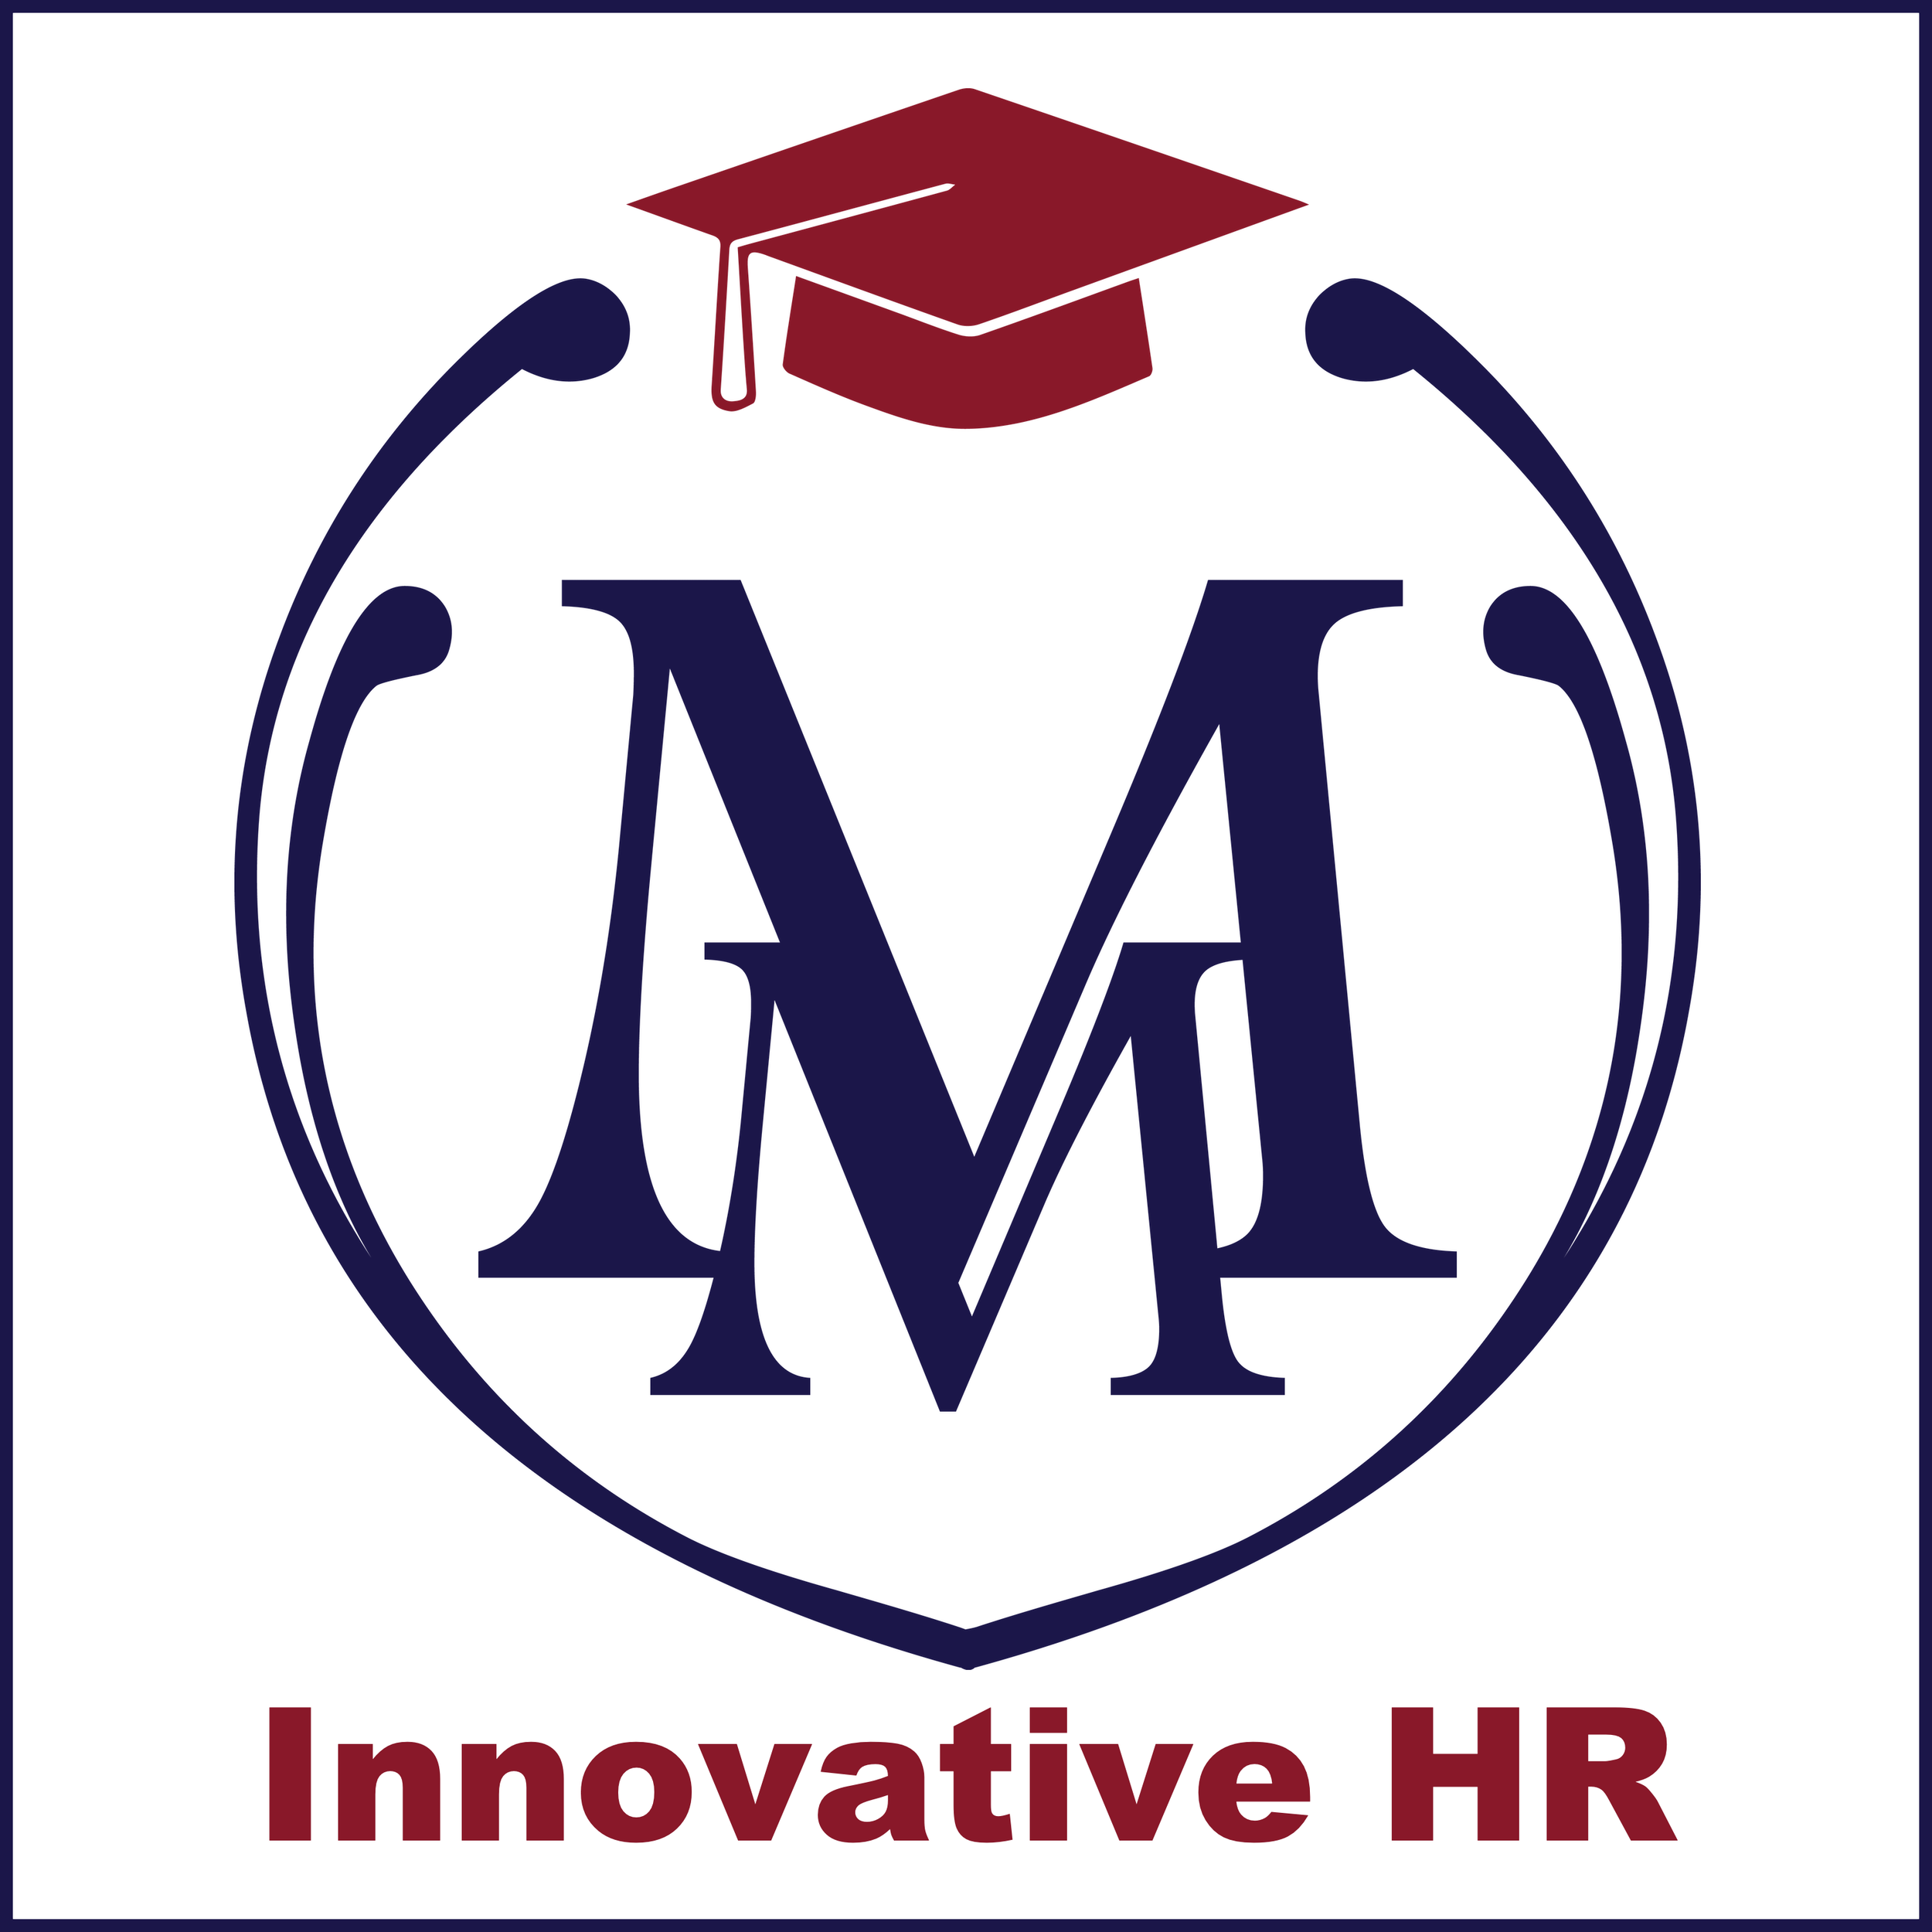 Innovative HR - Album Cover.png